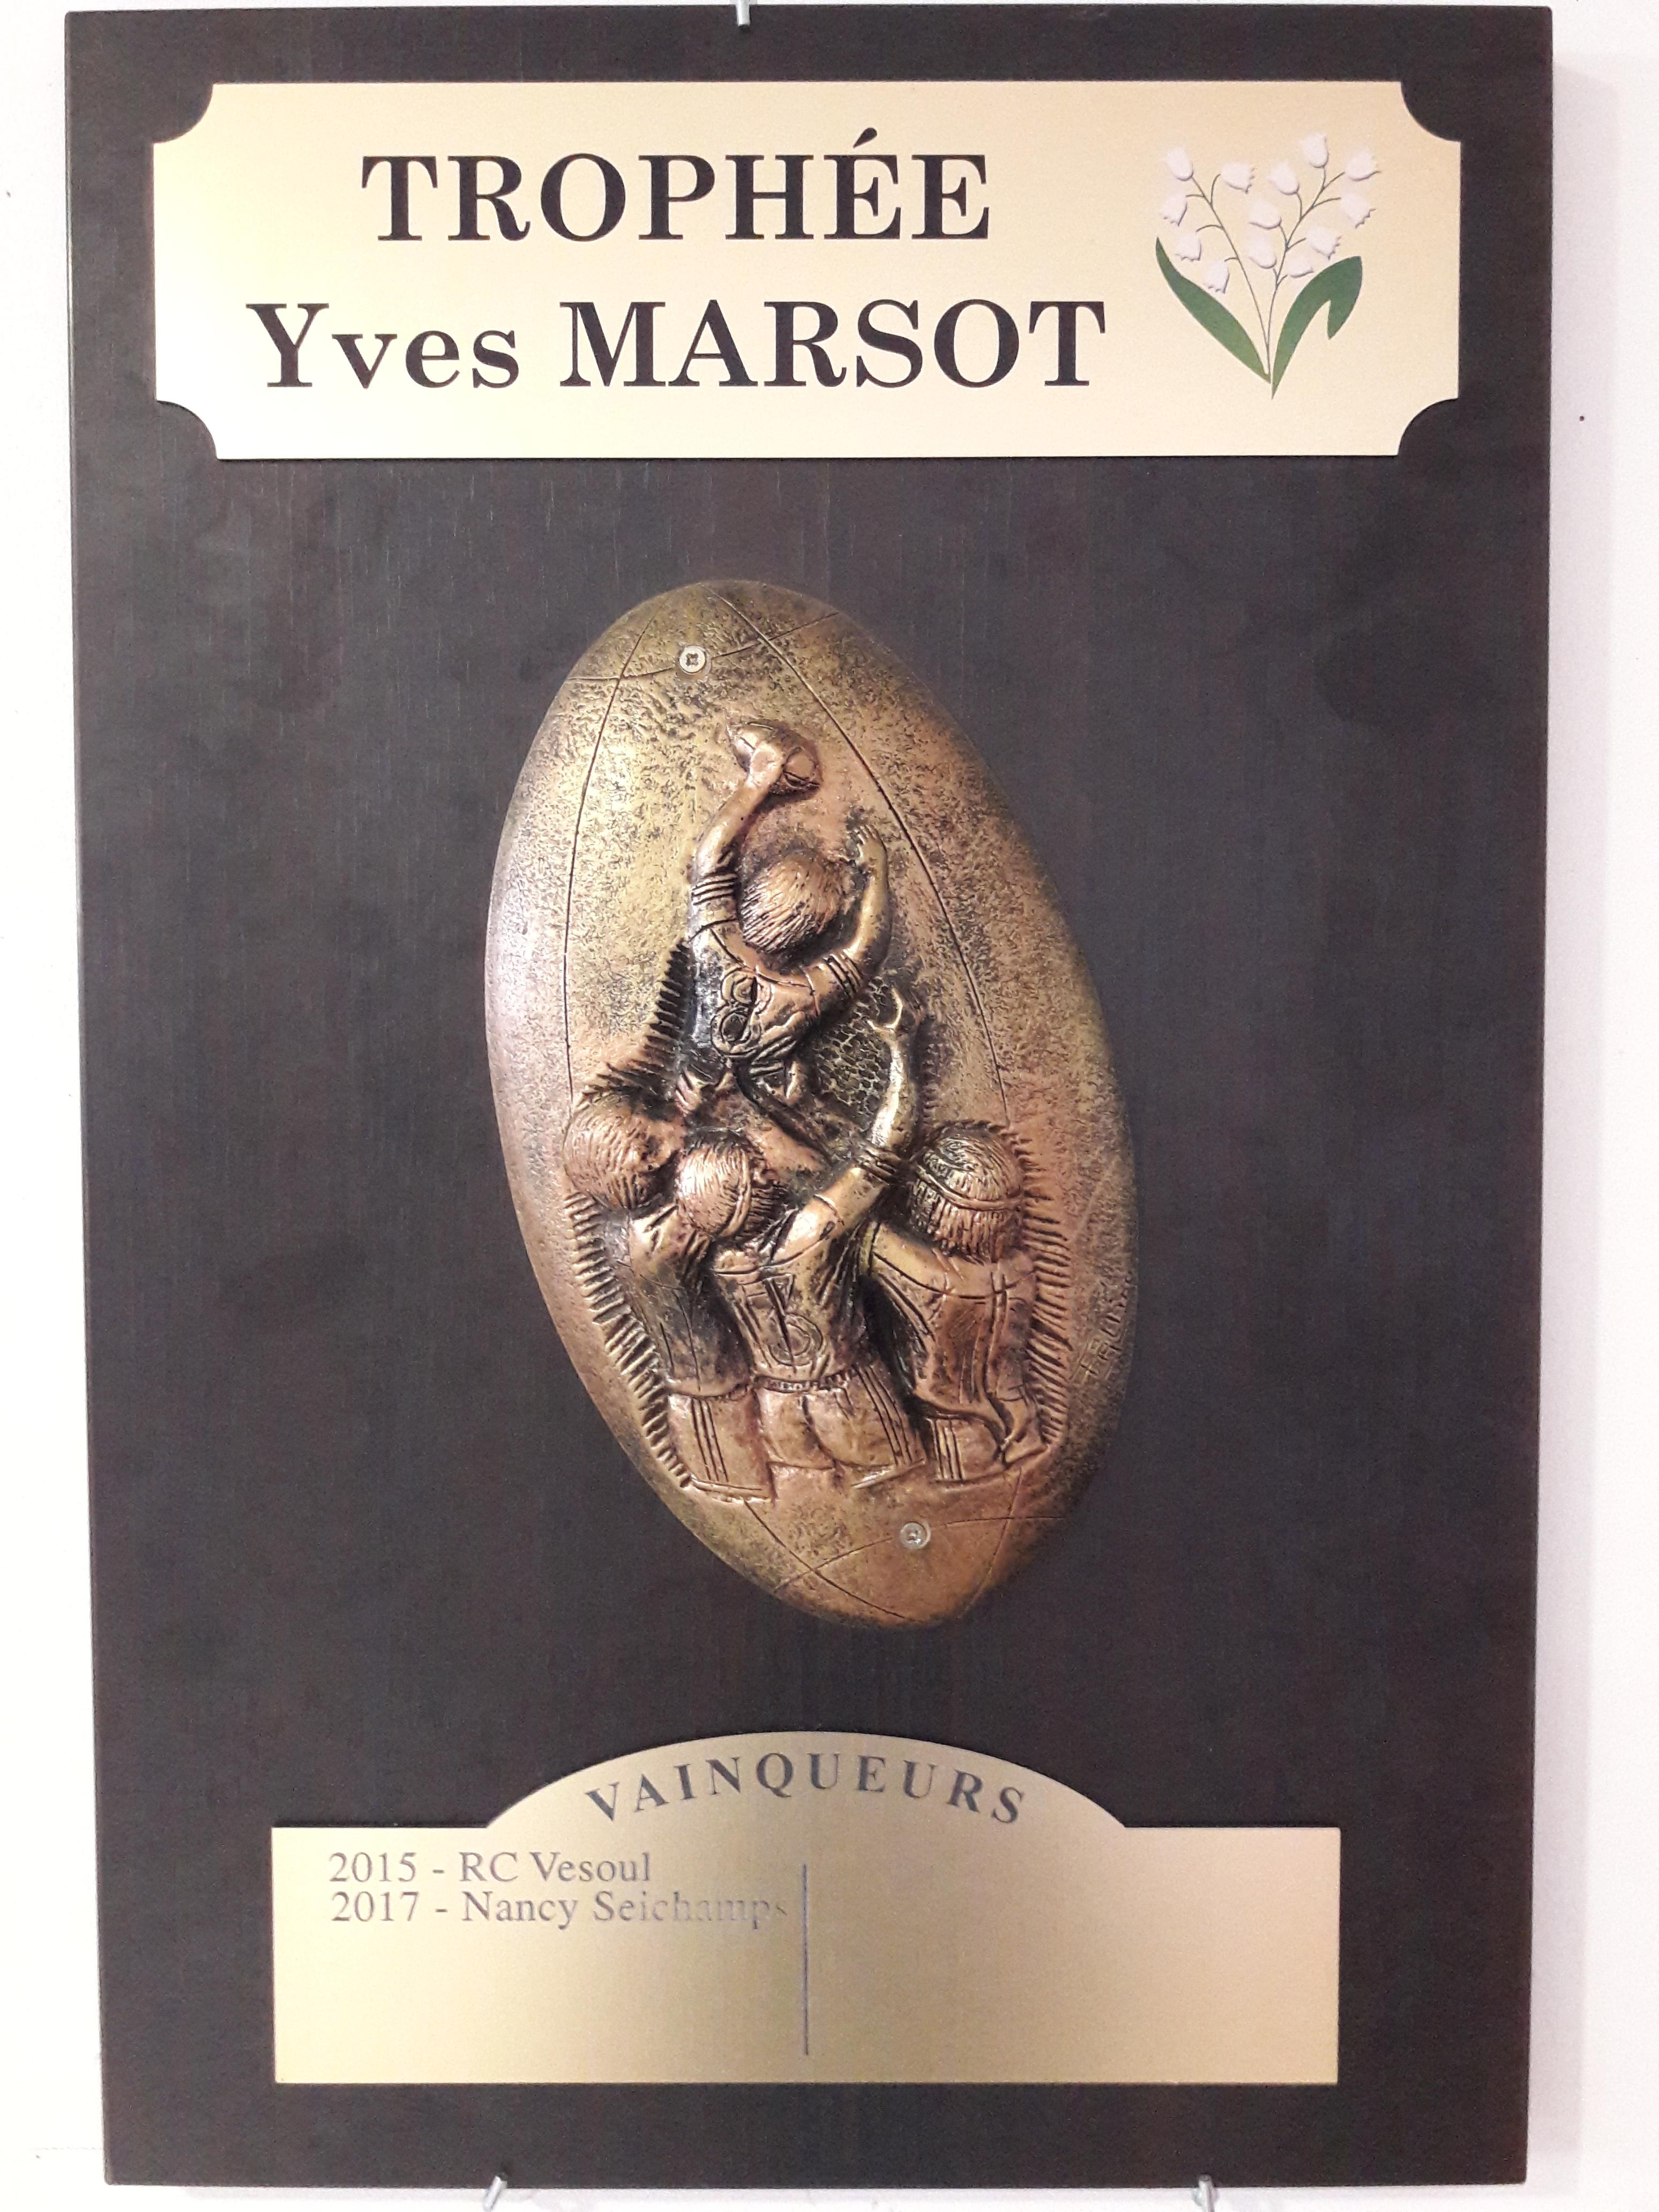 Challenge Yves Marsot